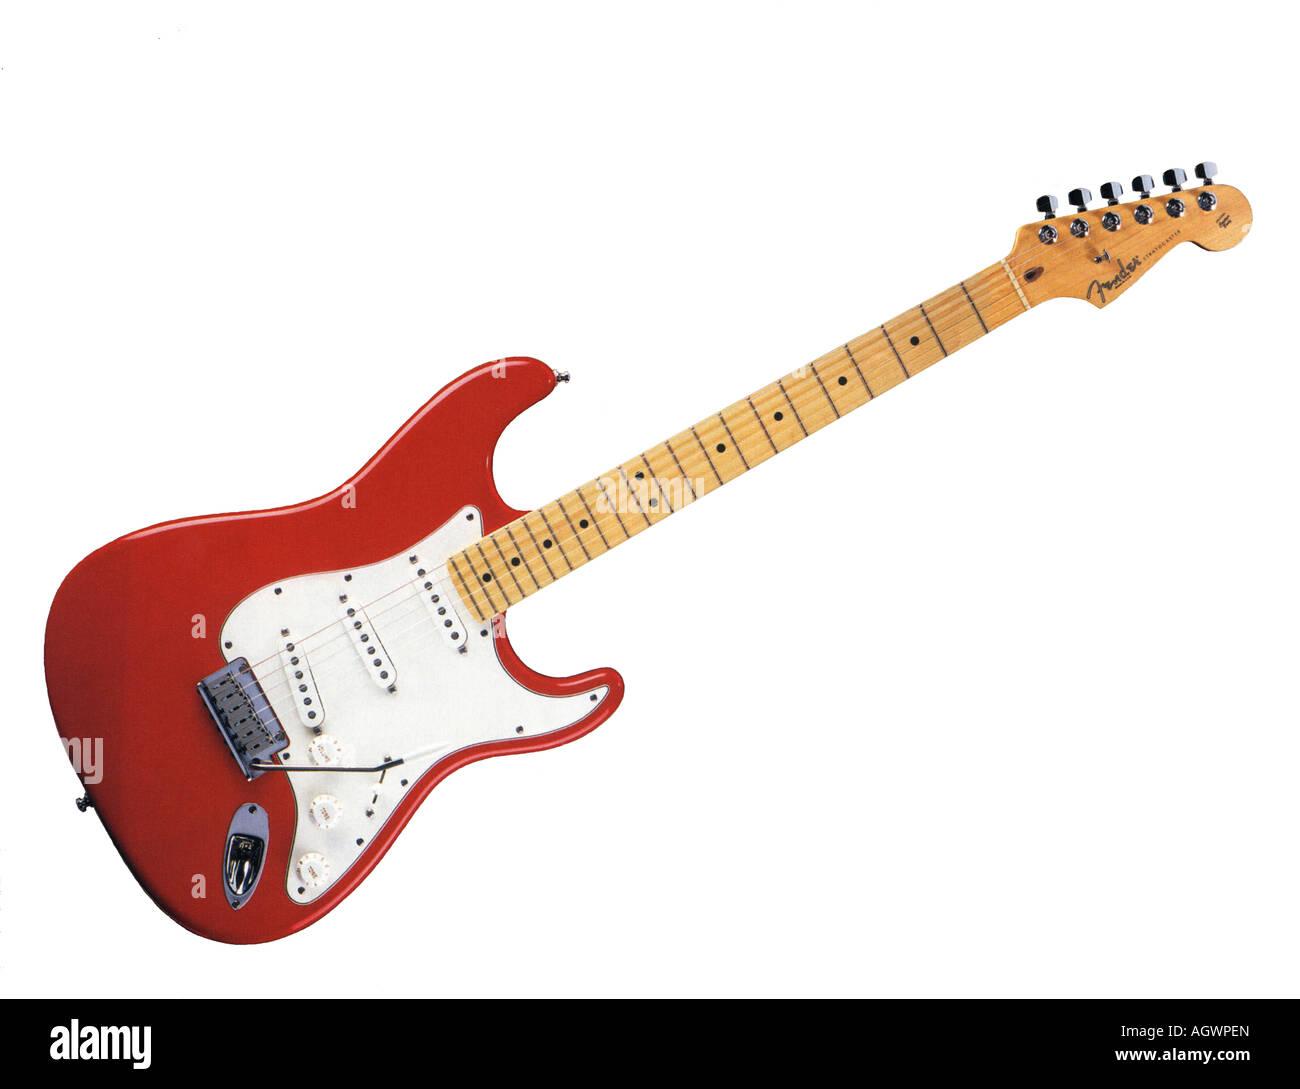 dd6d7136371a9 Fender Guitar Photos & Fender Guitar Images - Alamy